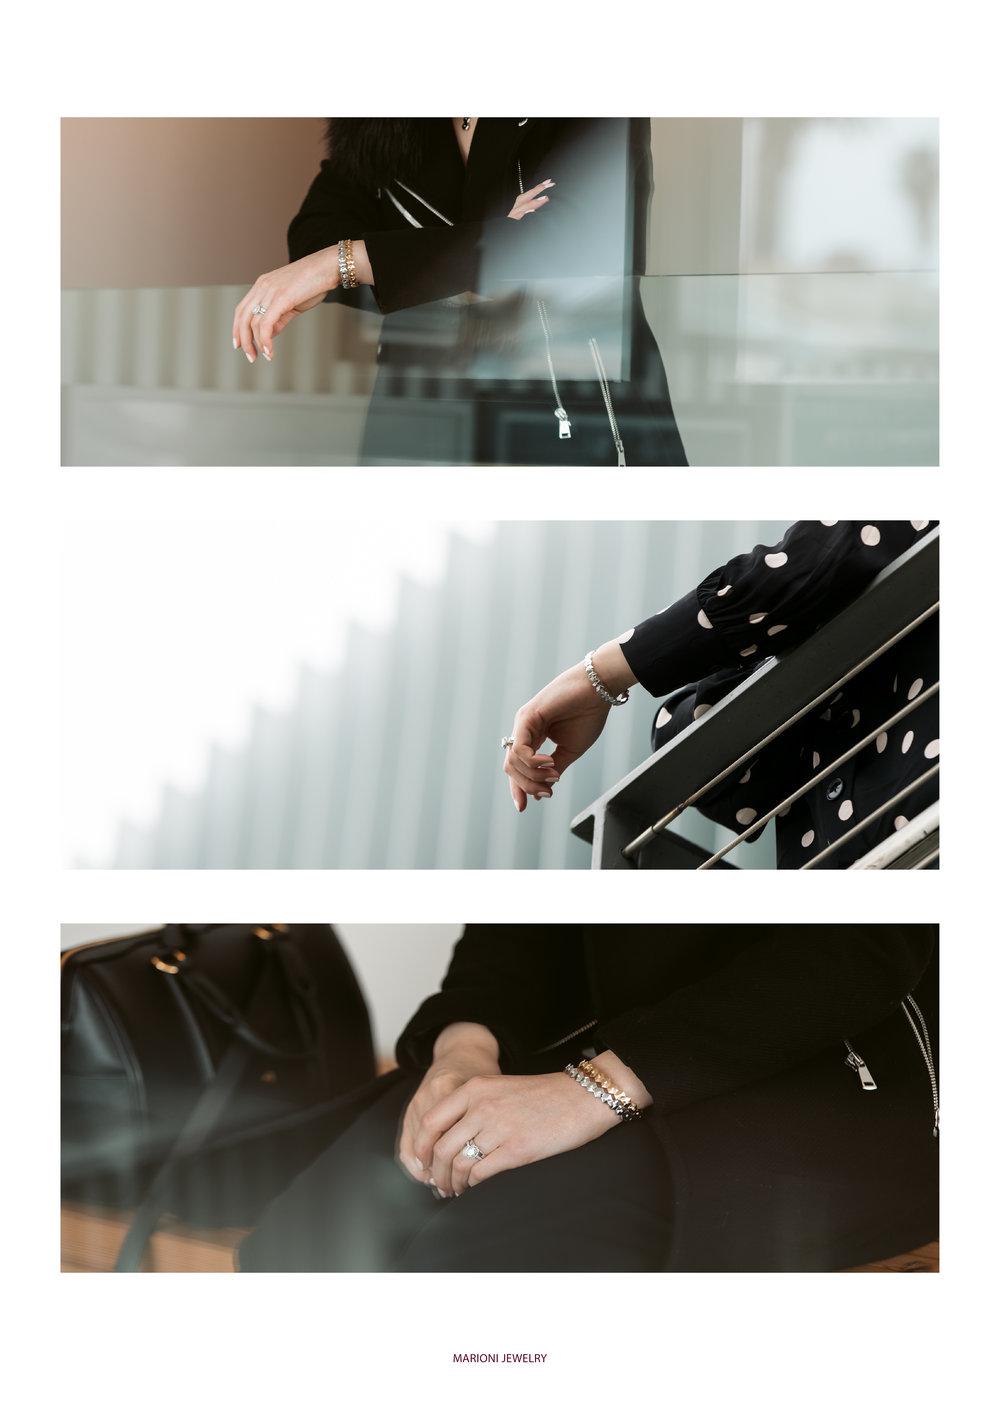 Marioni_Jewelry_Banners3.jpg